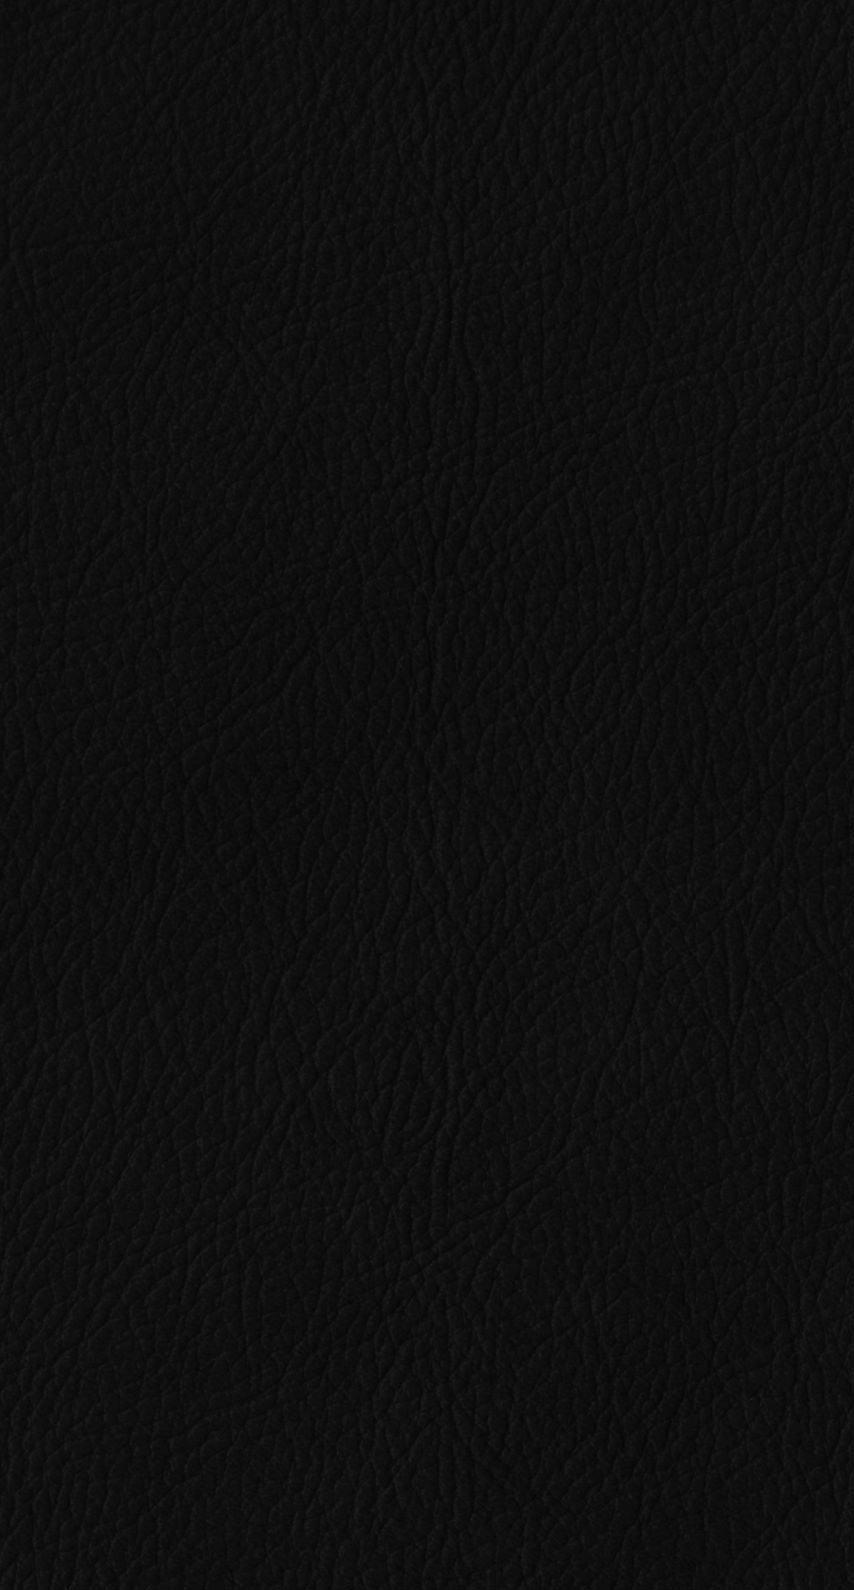 9000+ Wallpaper Black Iphone 7  Paling Keren